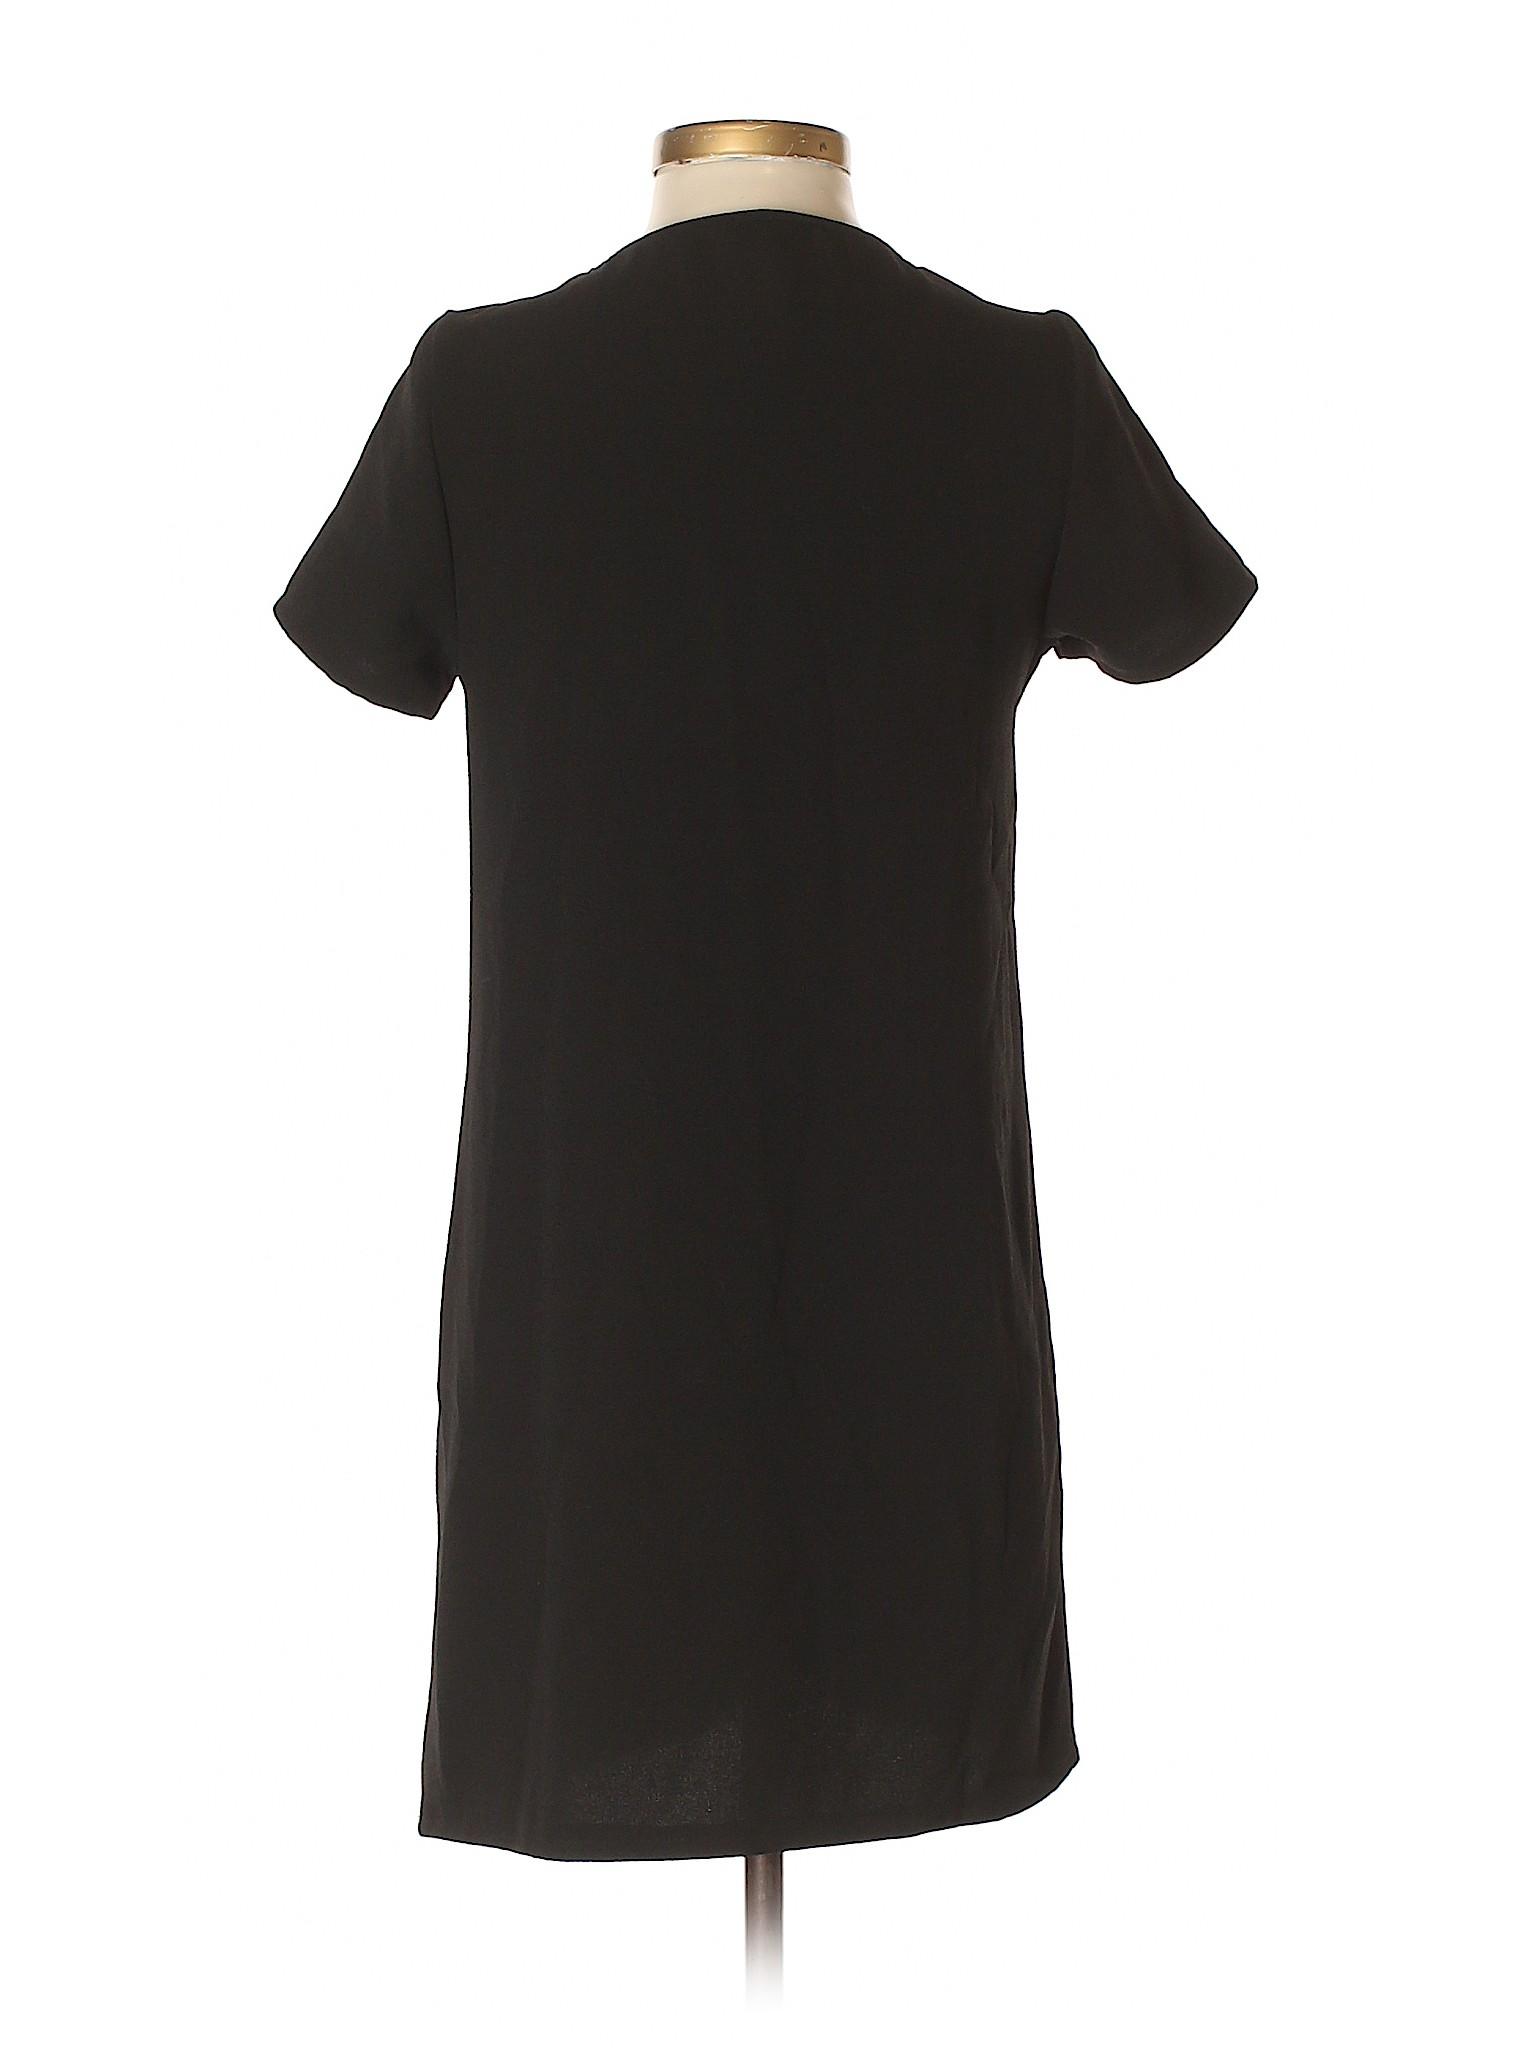 Casual Casual Teenplo Teenplo Casual Dress Selling Selling Dress Dress Selling Selling Teenplo gIppwxqZ7